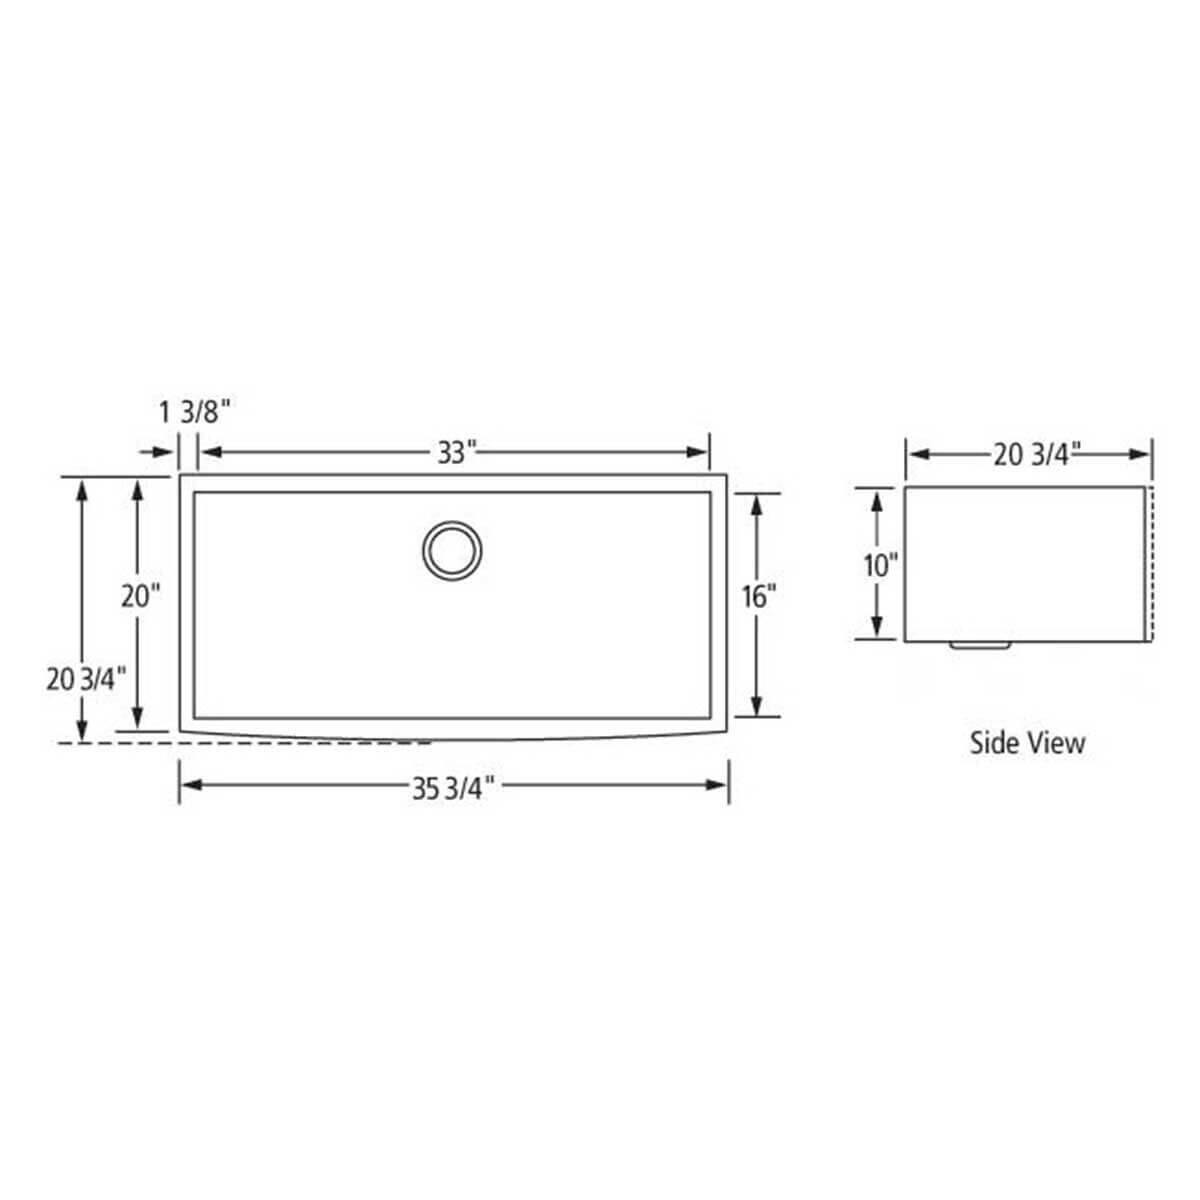 Artisan CPAZ3621-D10 Chef Pro Apron Sink Dimensions